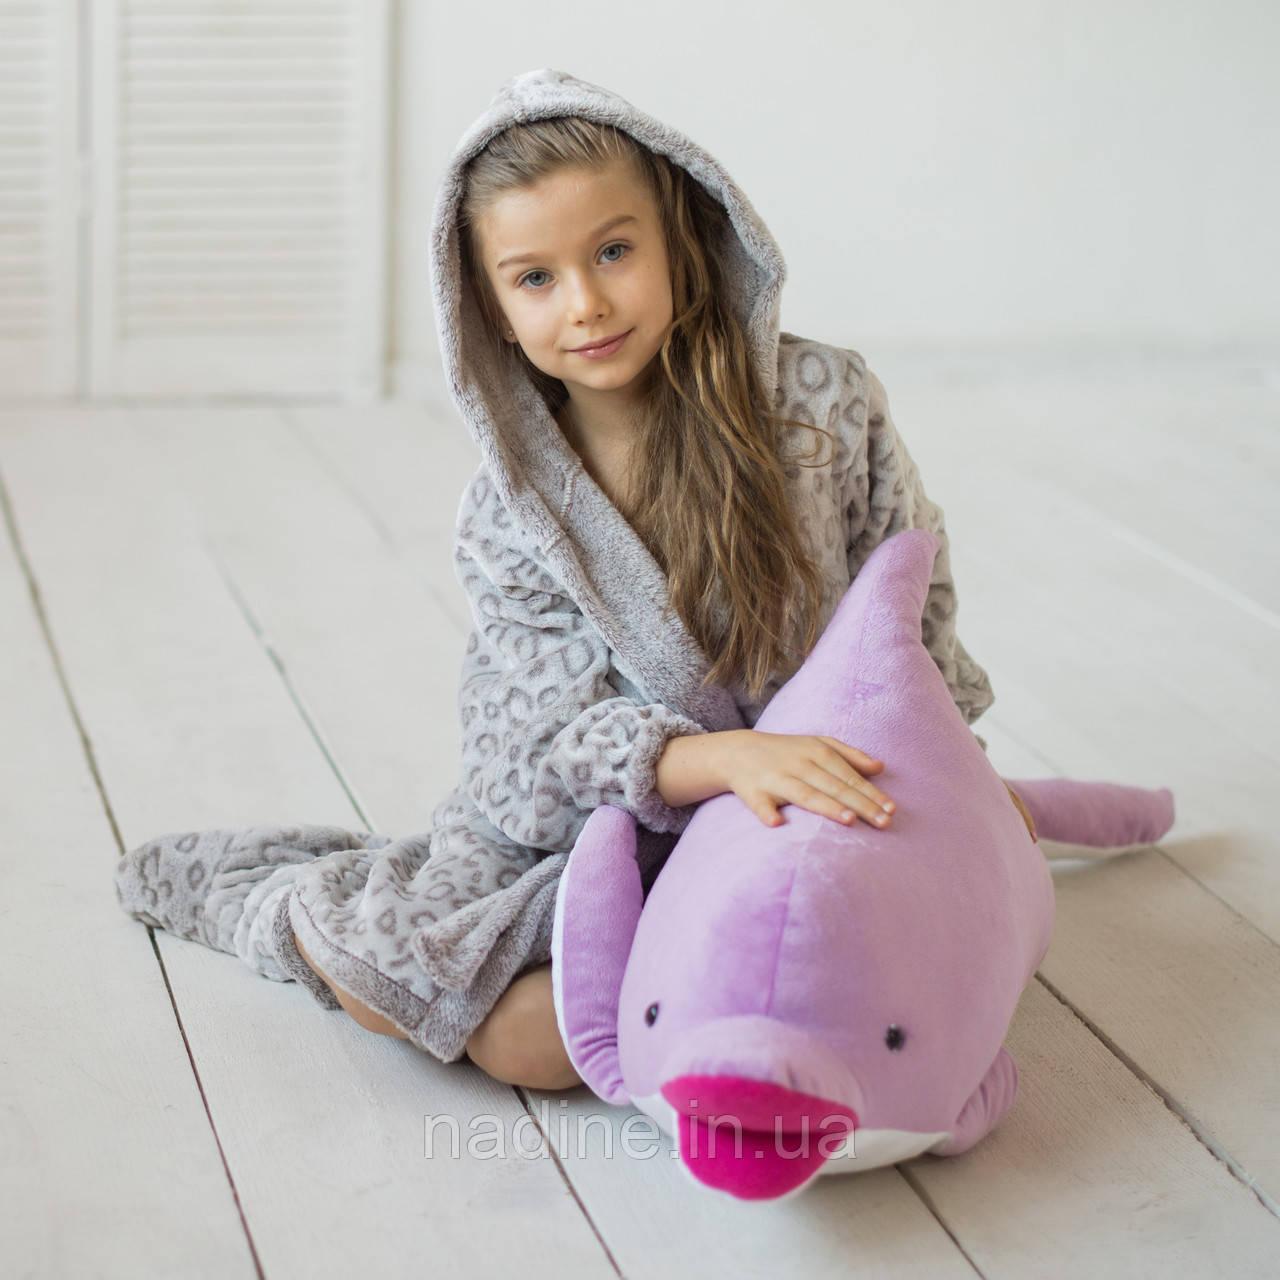 Халат Cream  для девочки  Eirena Nadine (22-455) рост 116-122